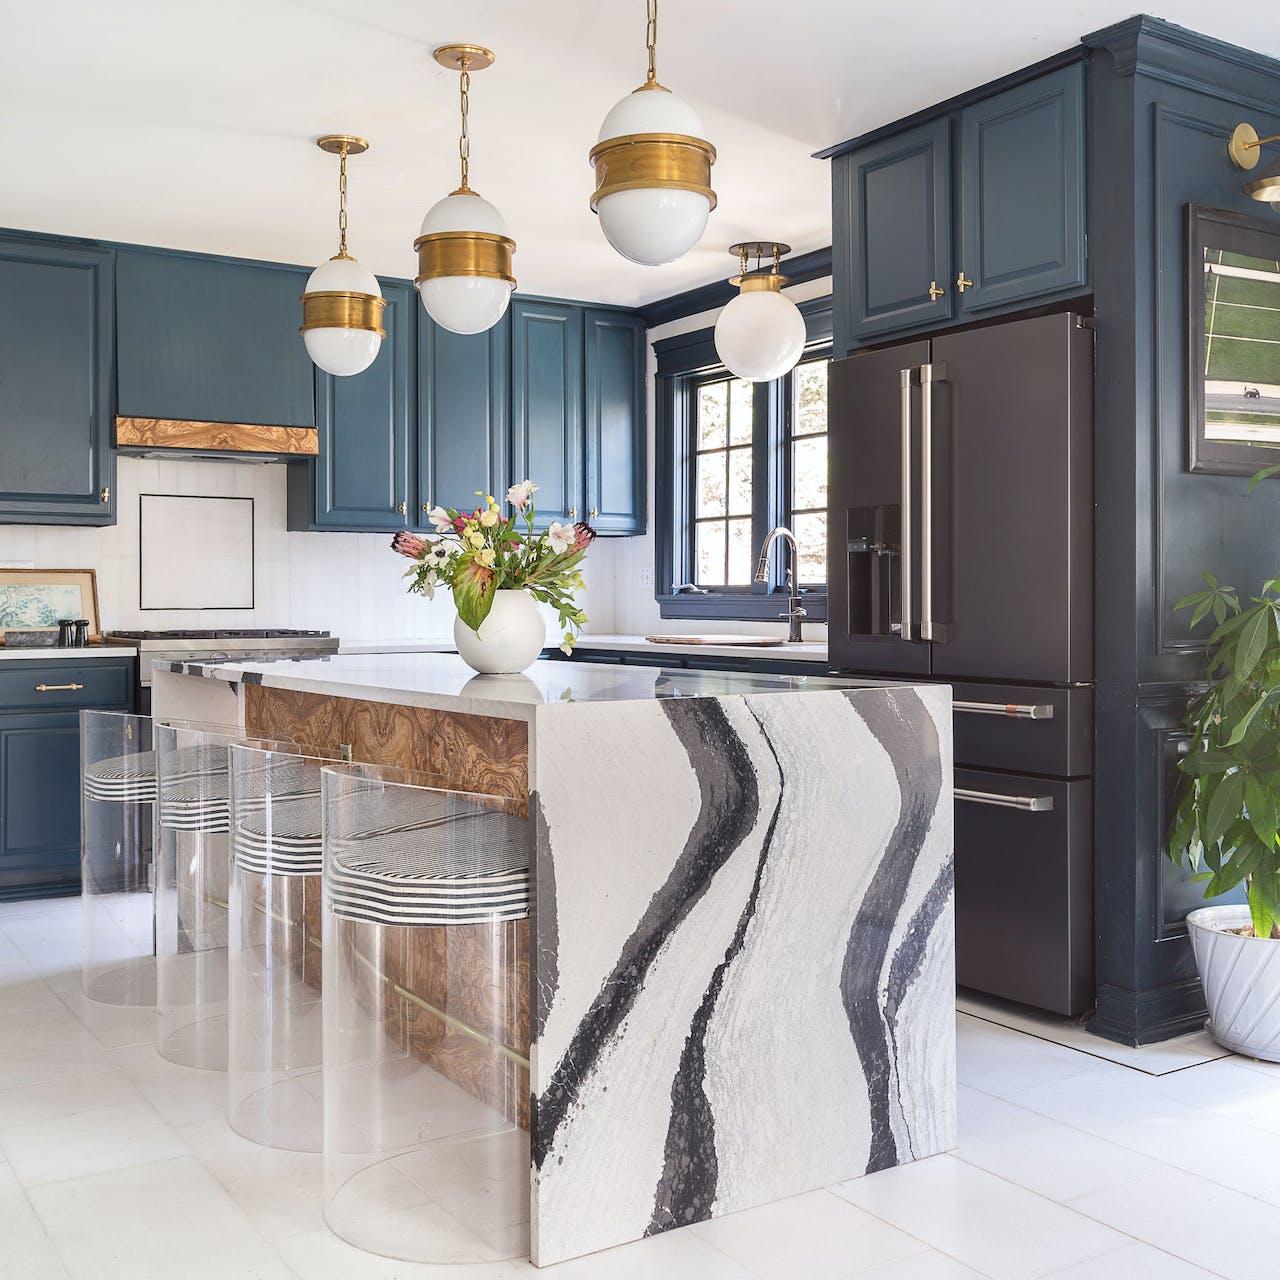 cambria countertop with matte black refrigerator in blue cabinets